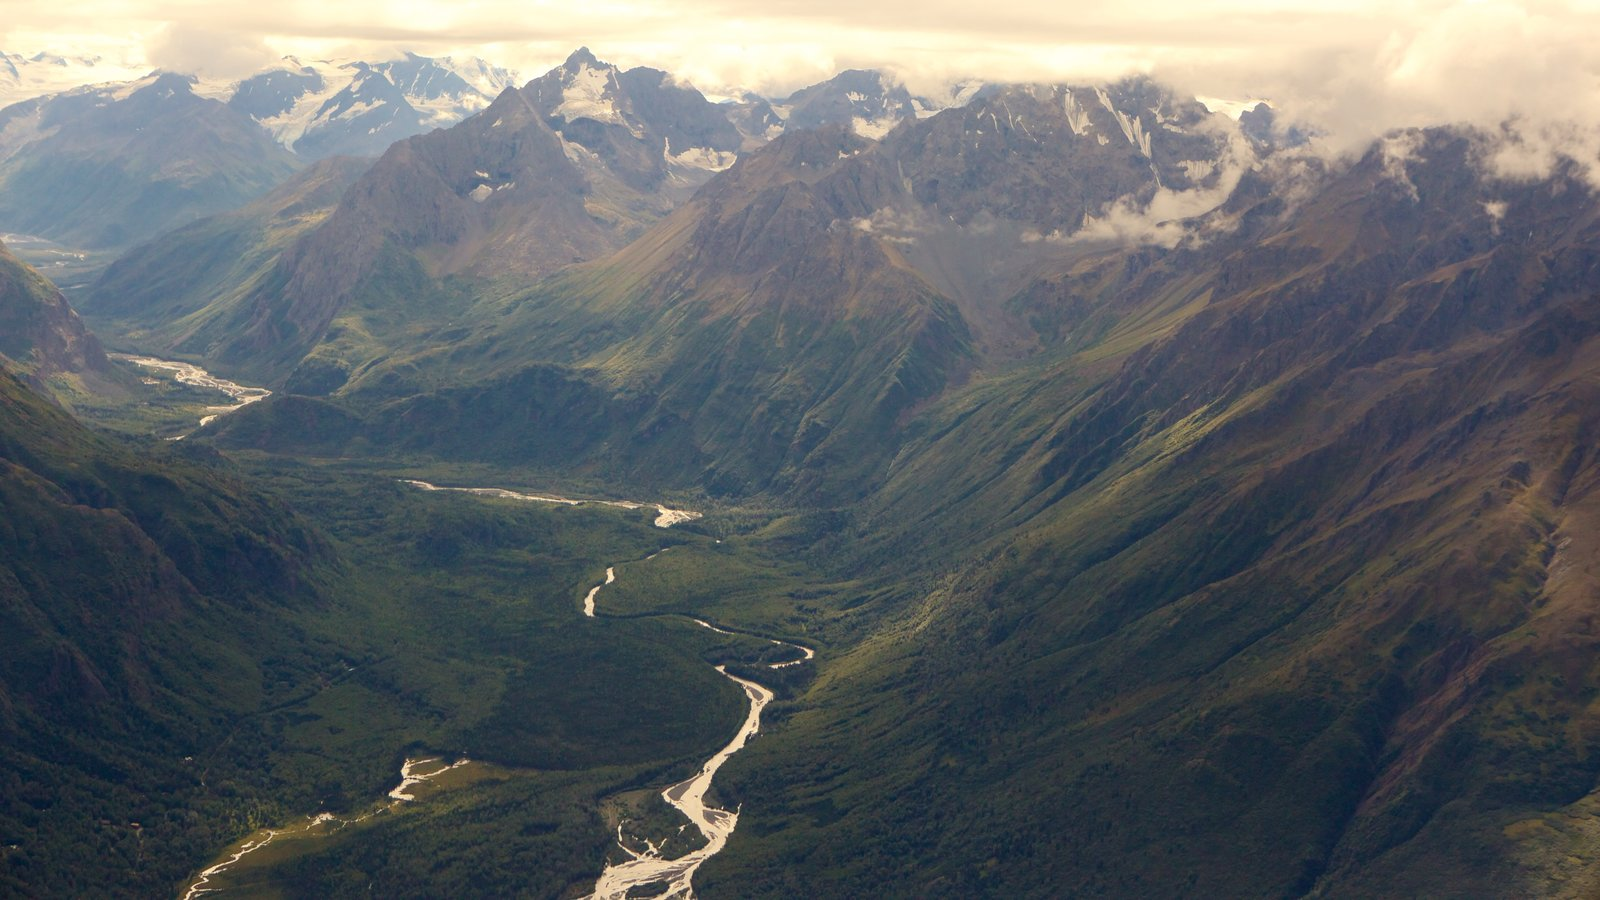 Chugach State Park featuring mountains